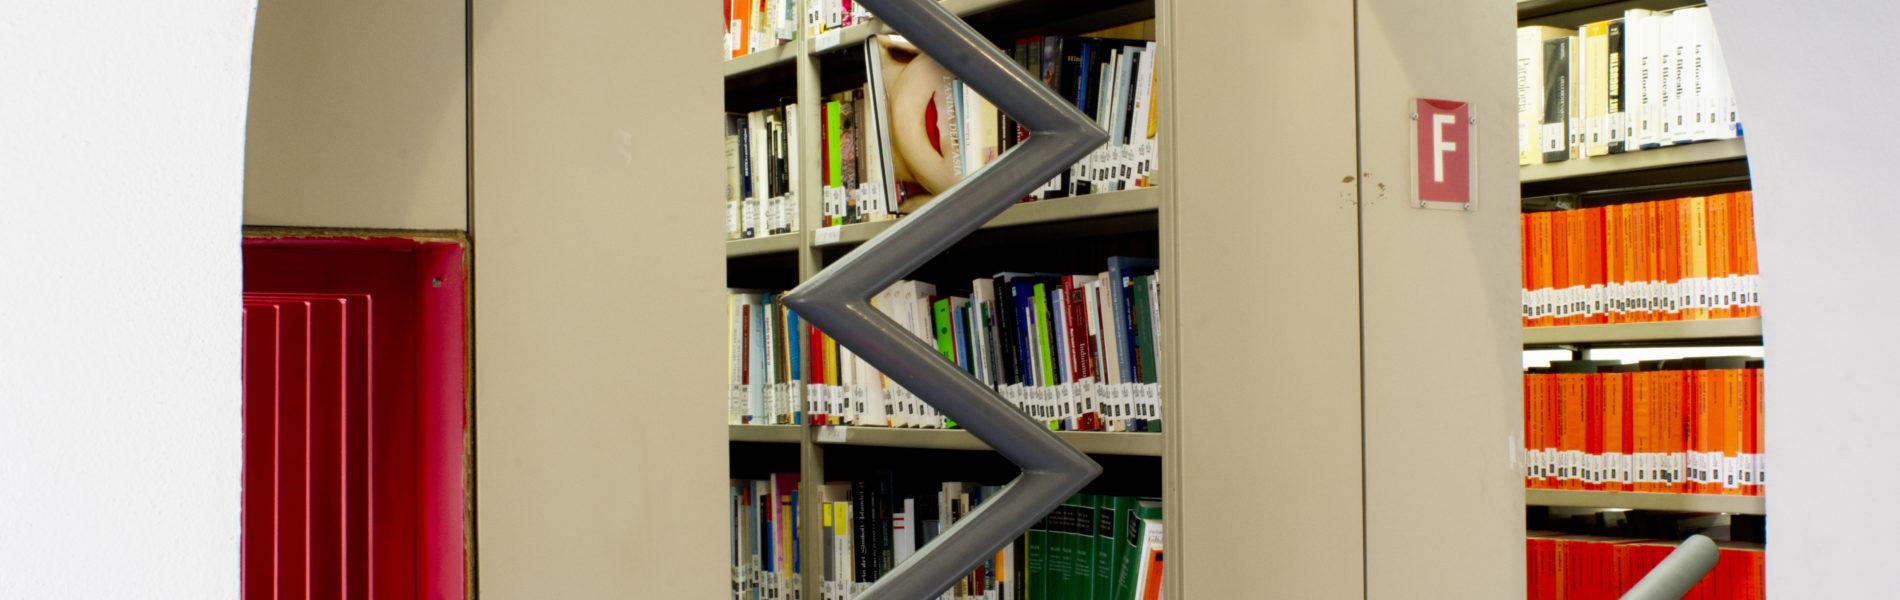 Biblioteche_ricerca